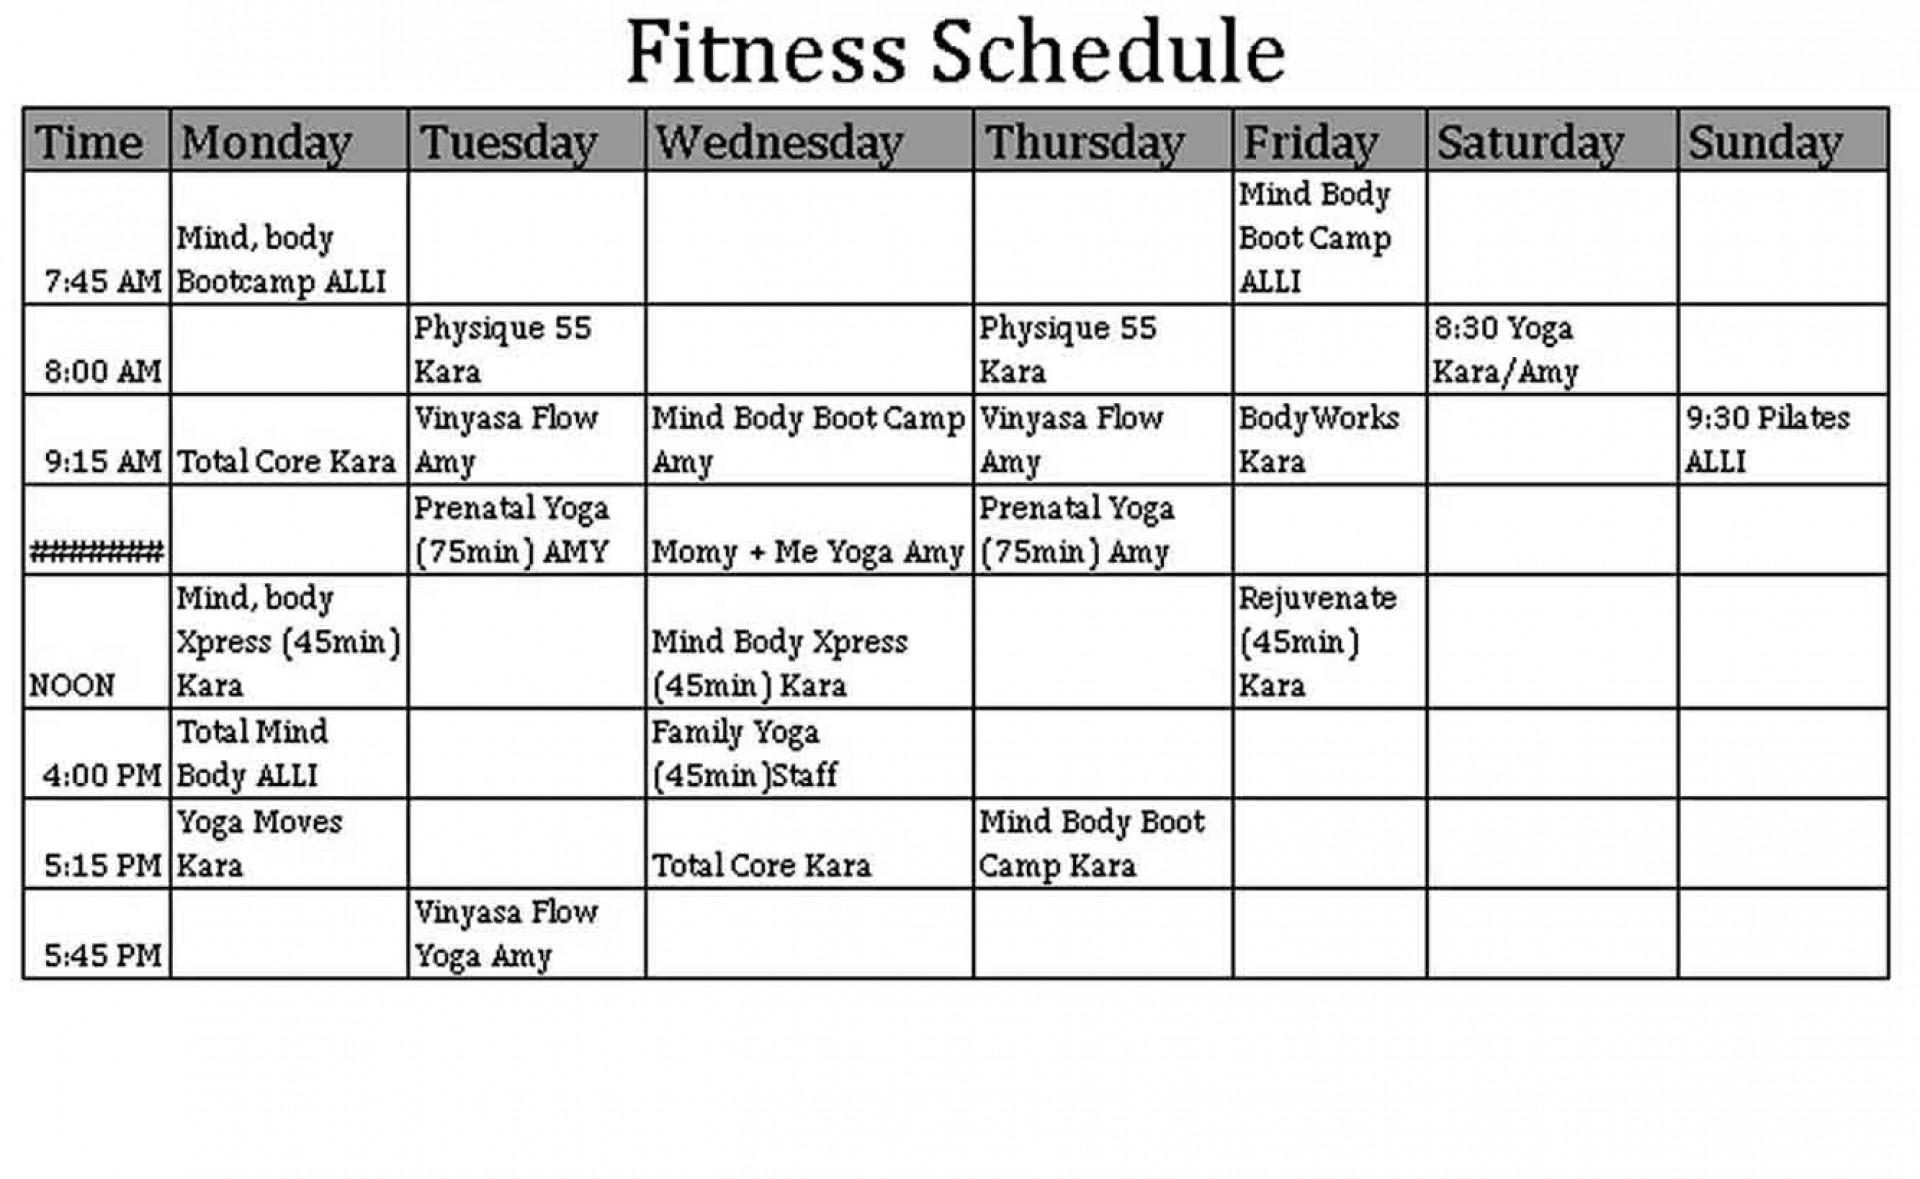 004 Frightening Weekly Workout Schedule Template Inspiration  12 Week Plan Training Calendar1920